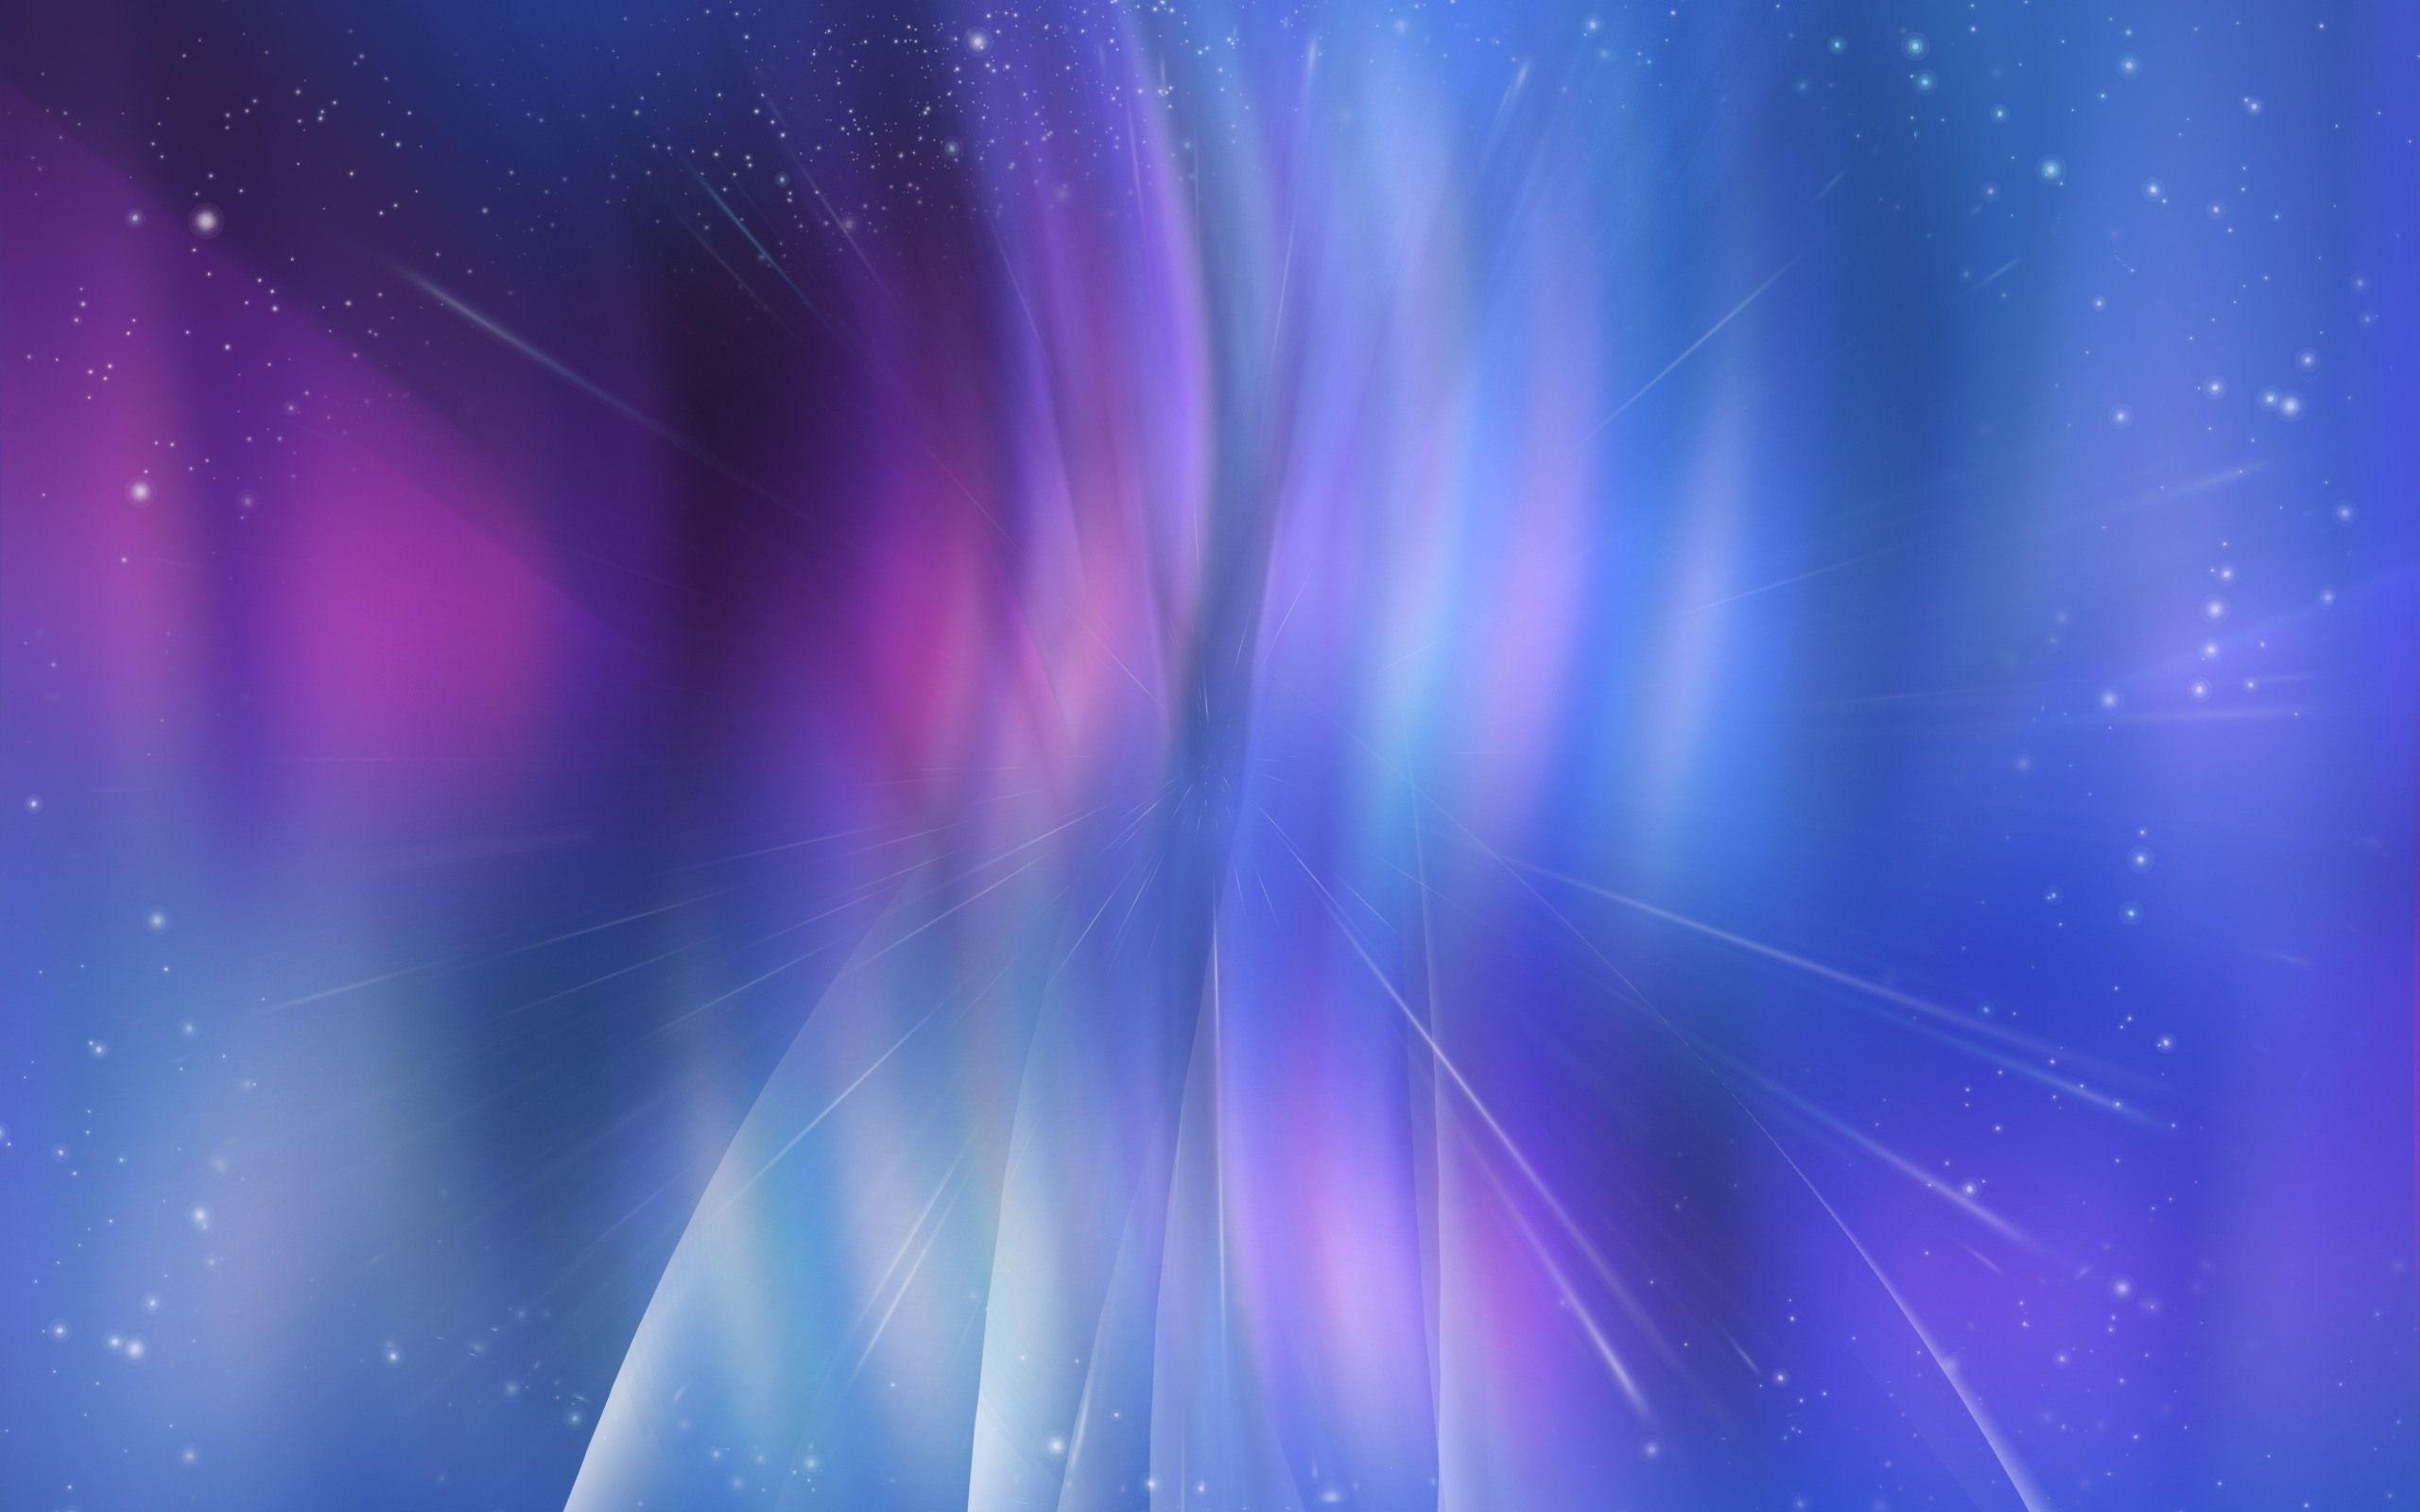 Neon Purple Backgrounds - Wallpaper Cave